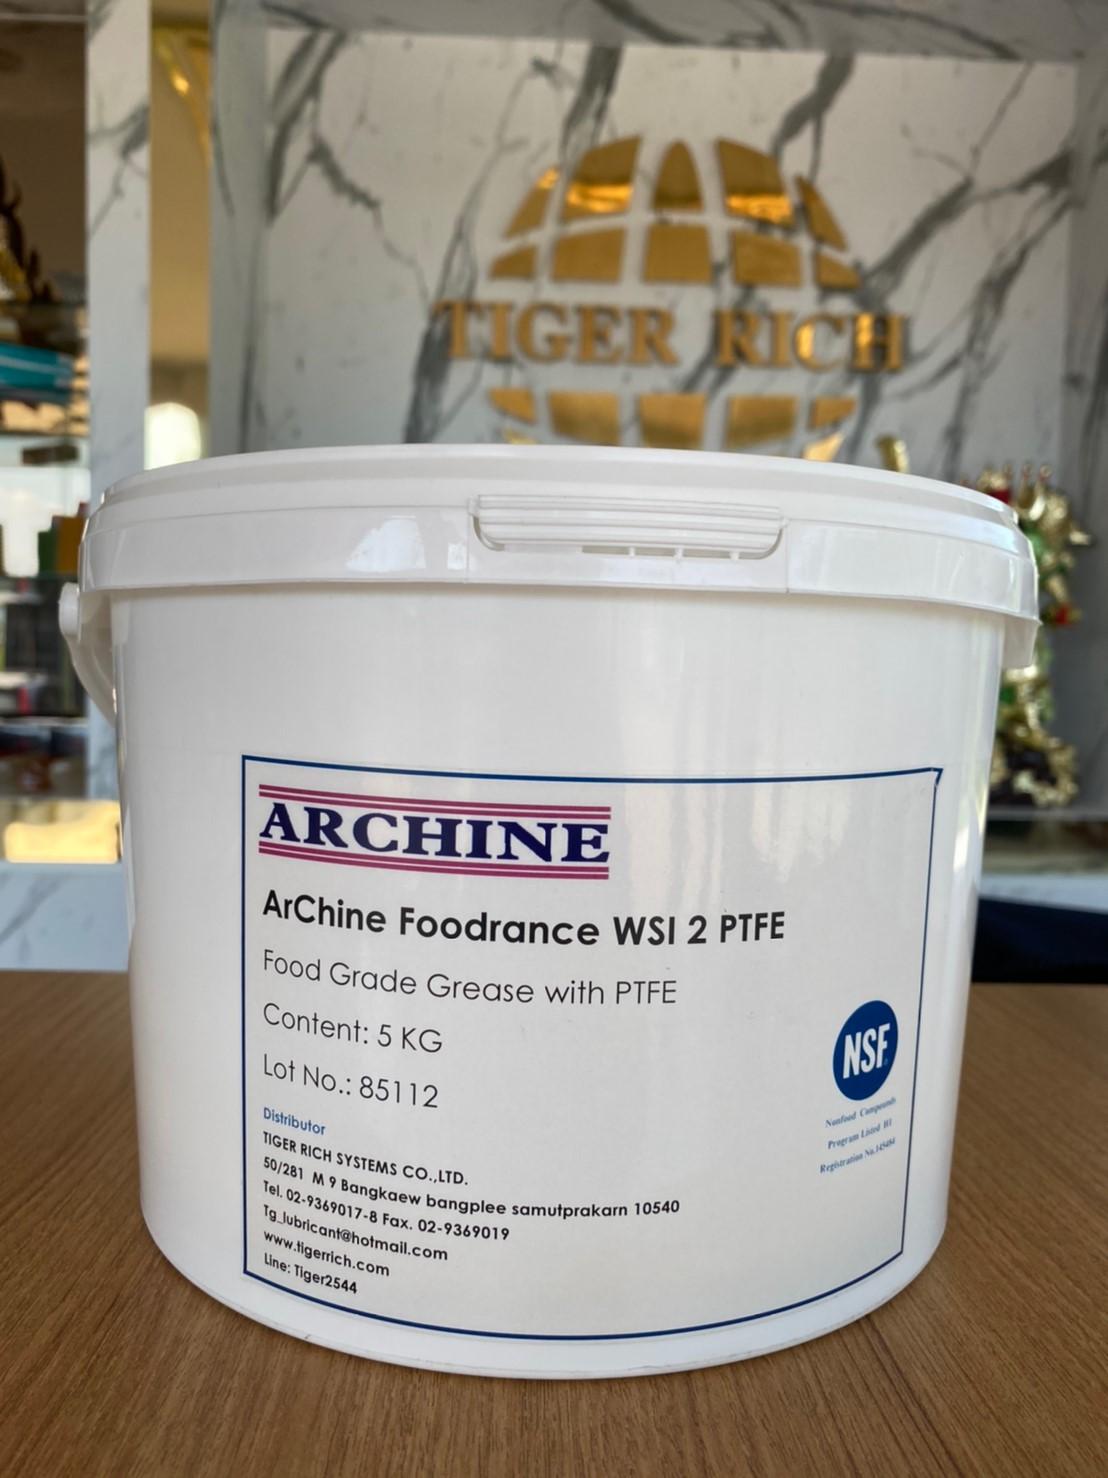 ArChine Foodrance WSI 2 PTFE